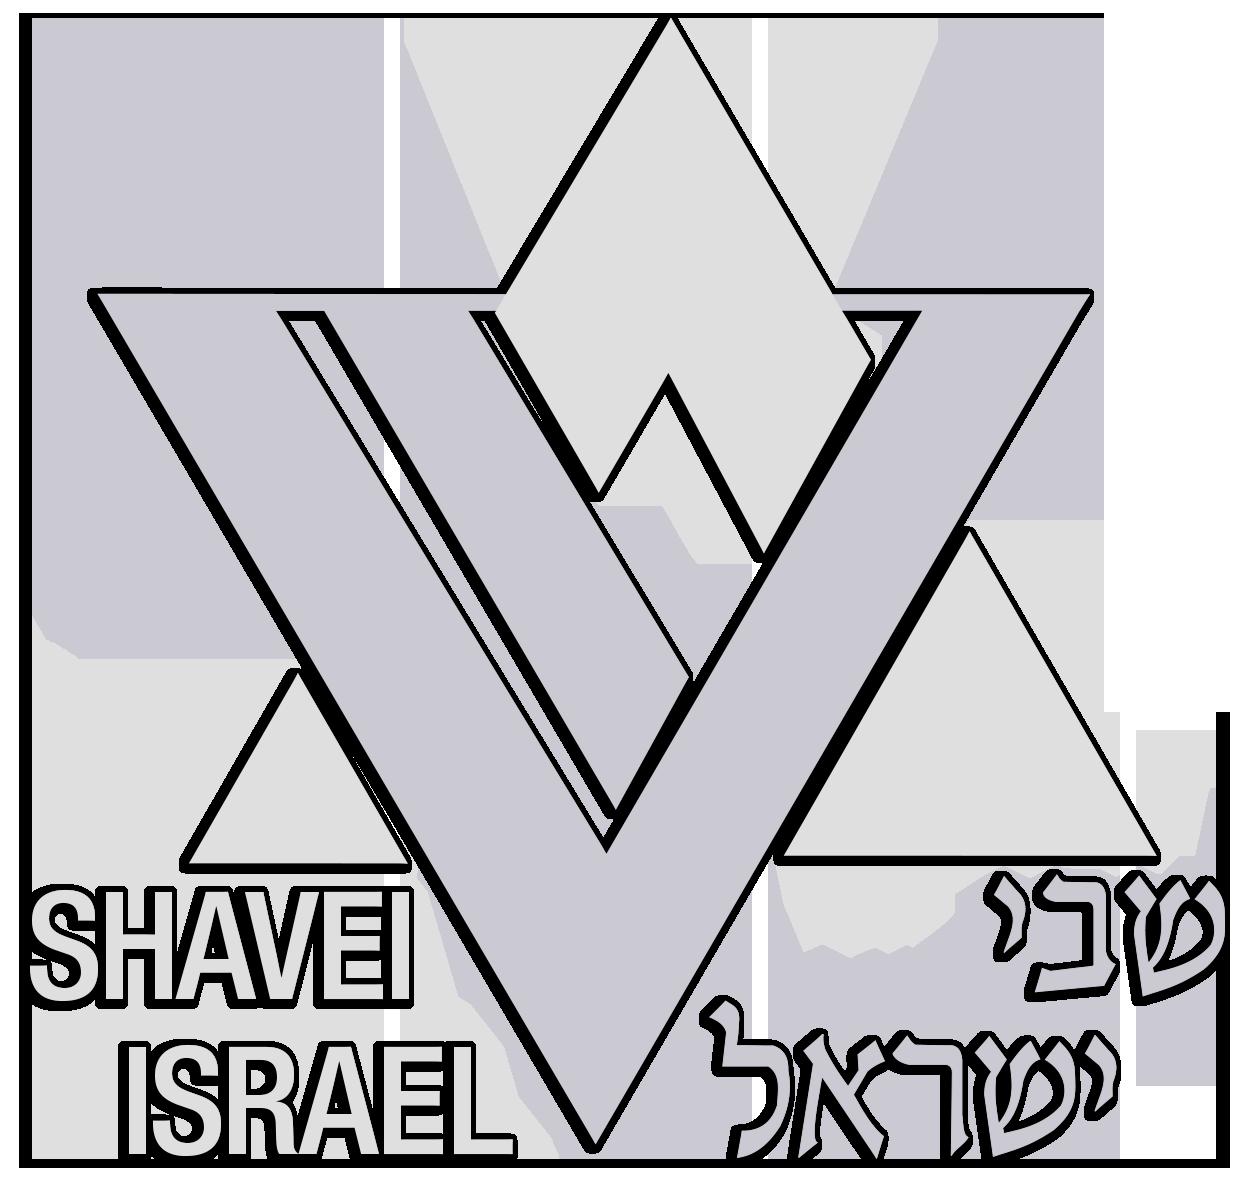 Shavei Israel logo